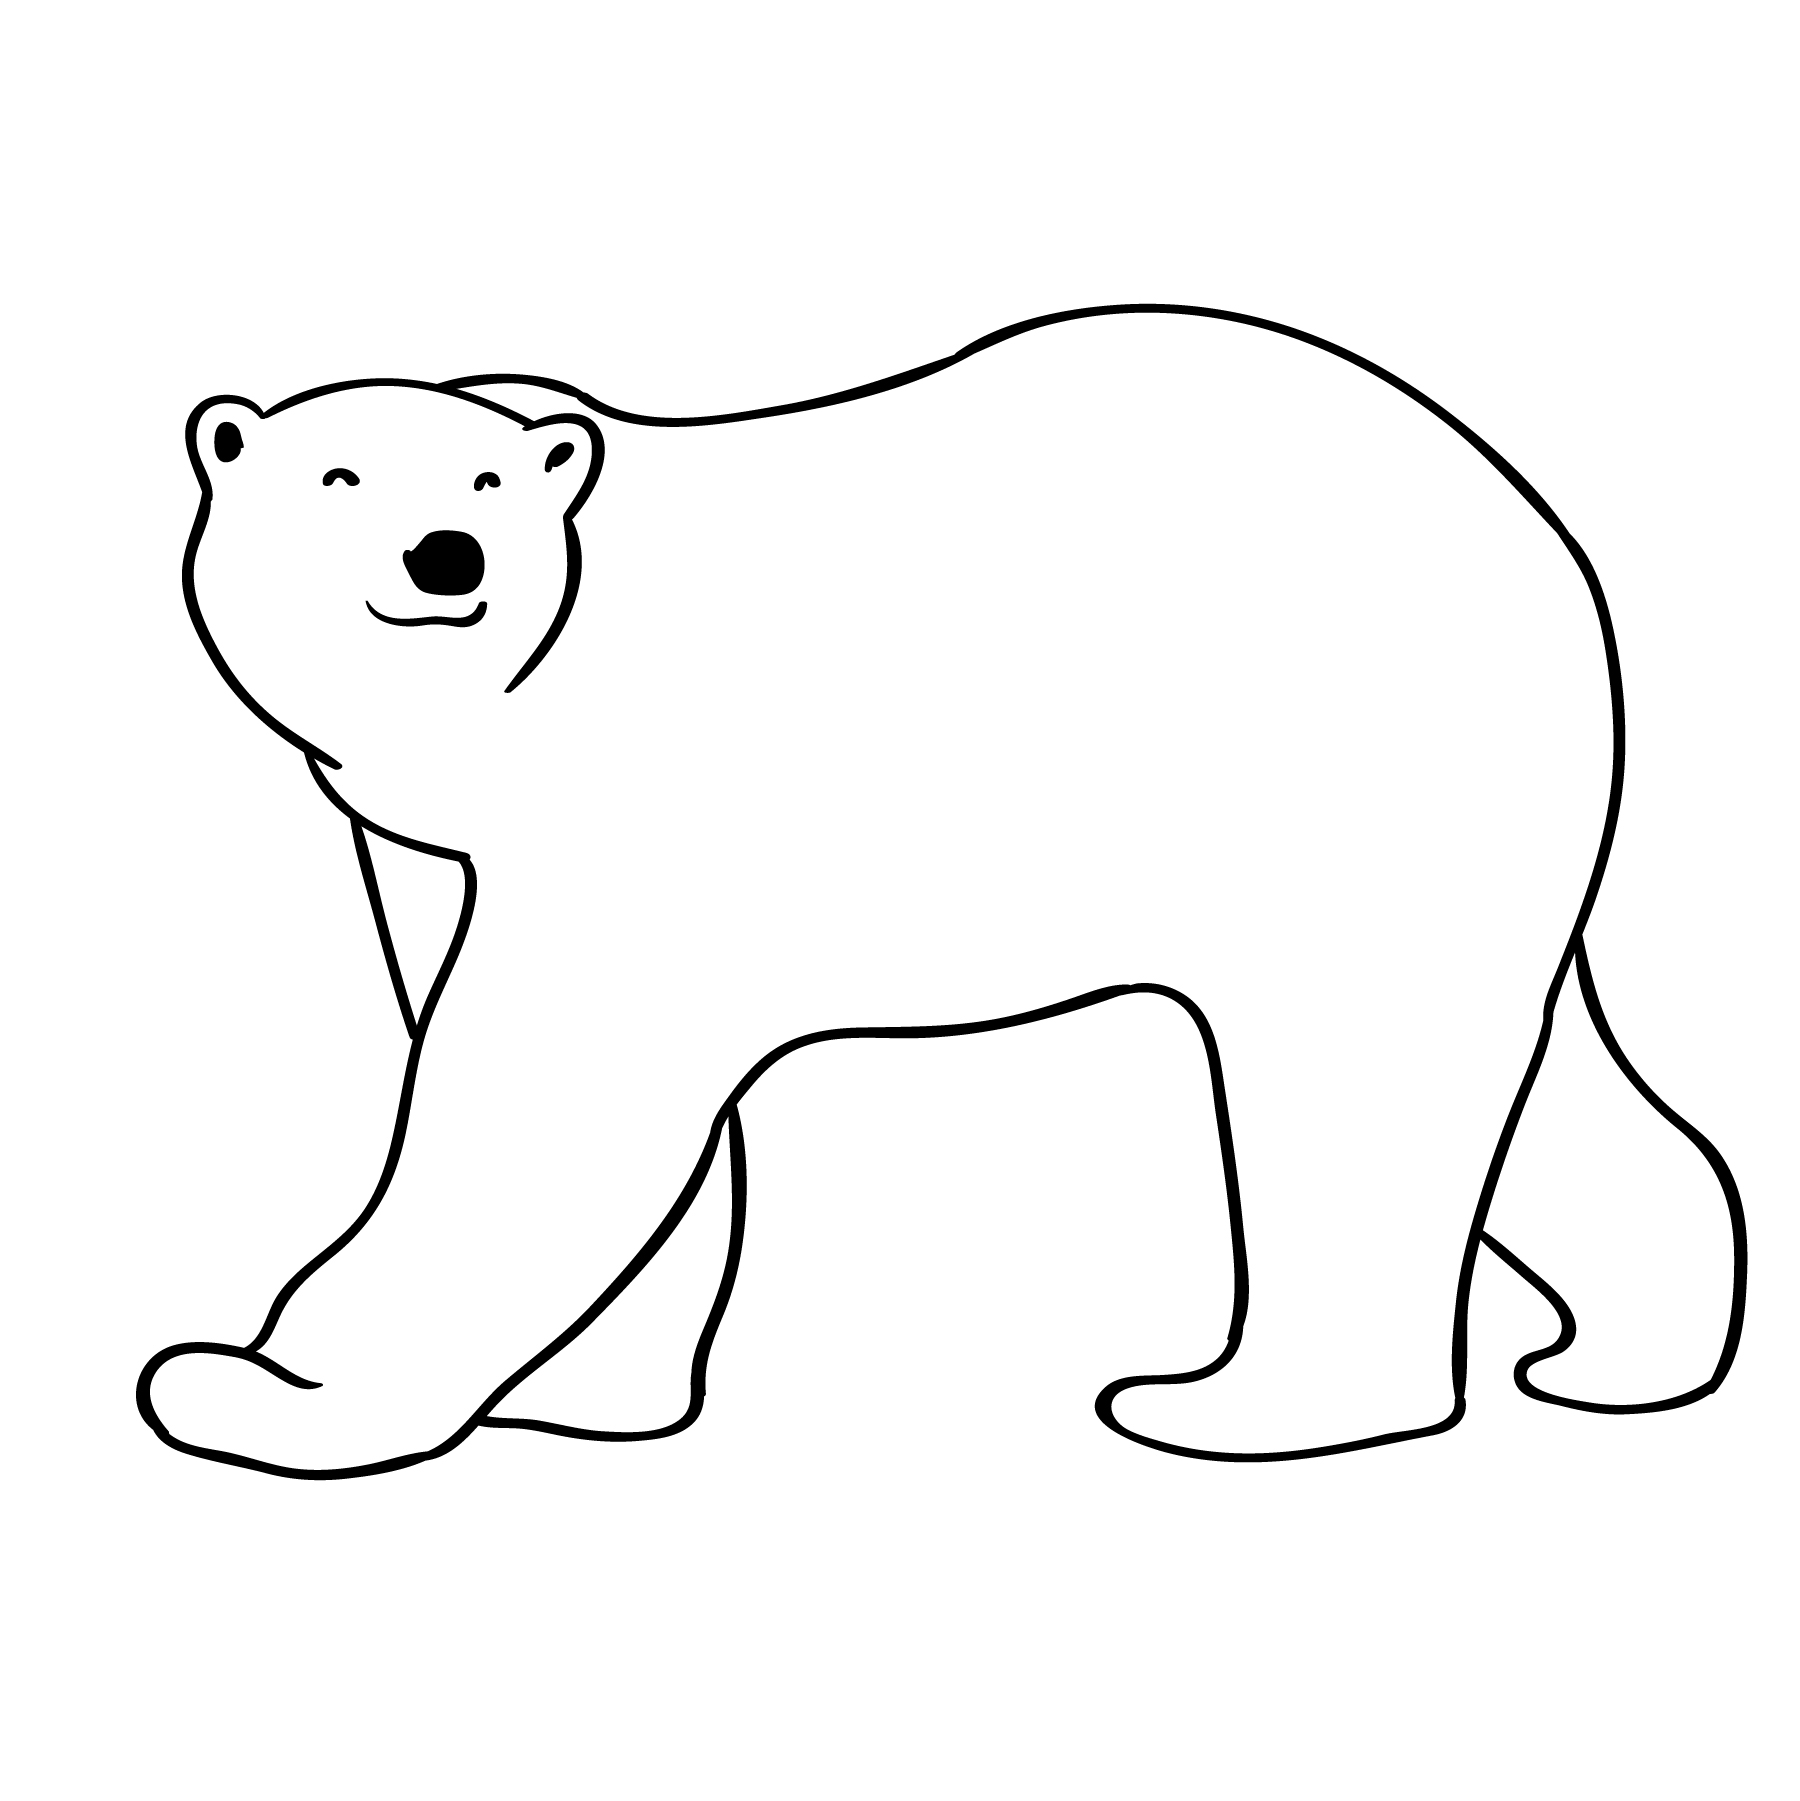 polar bear download free vector art stock graphics images. Black Bedroom Furniture Sets. Home Design Ideas